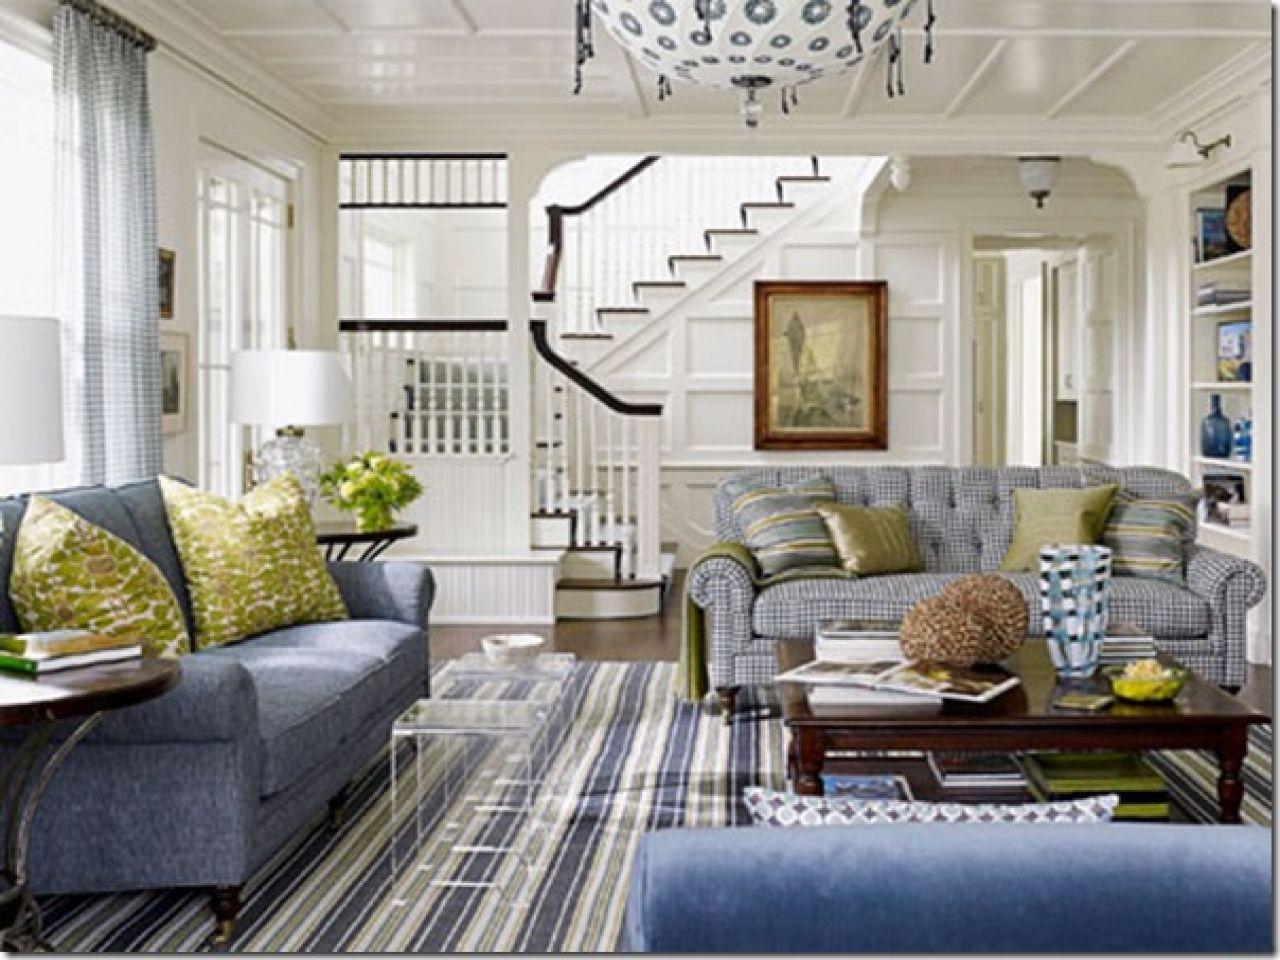 Bildresultat för living room with blue and green accents